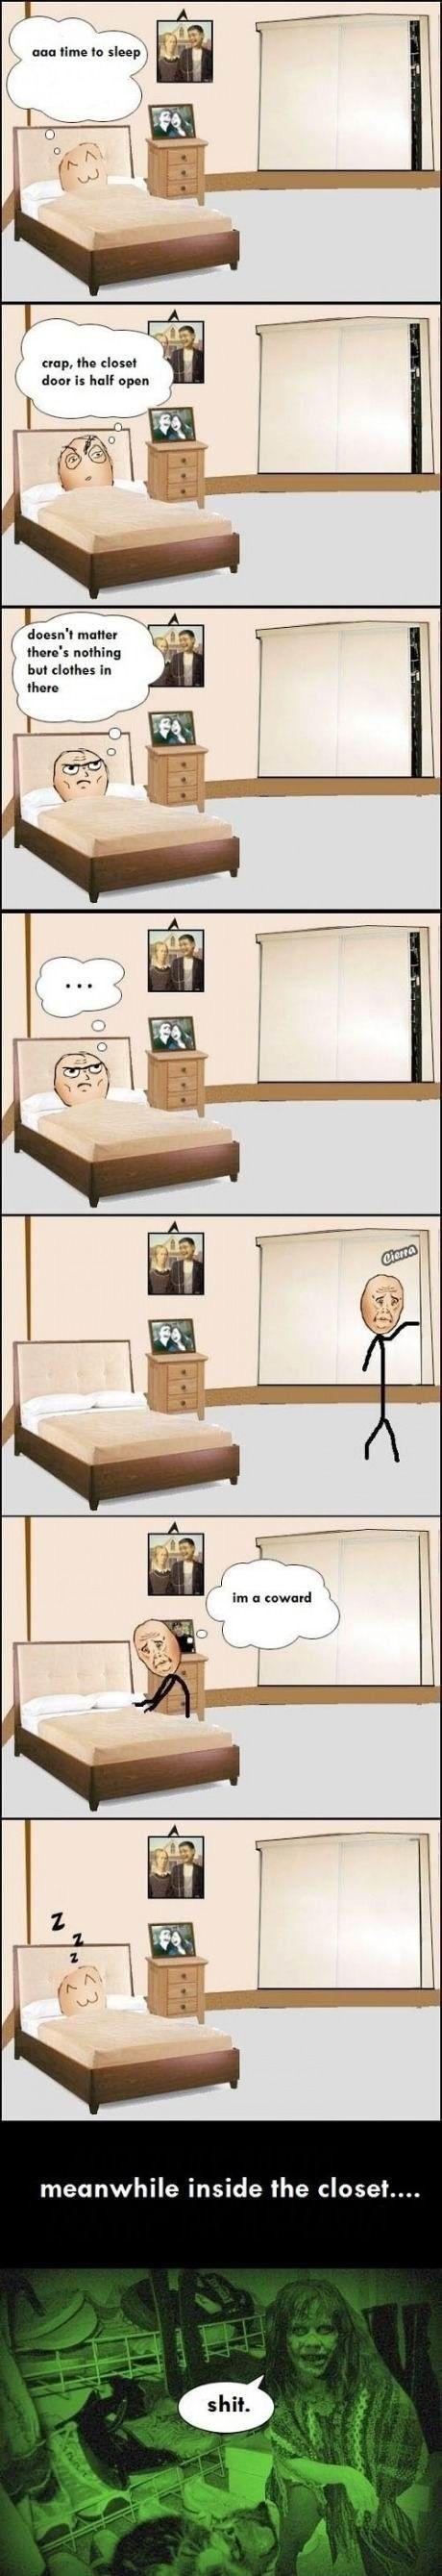 Funny Picdump